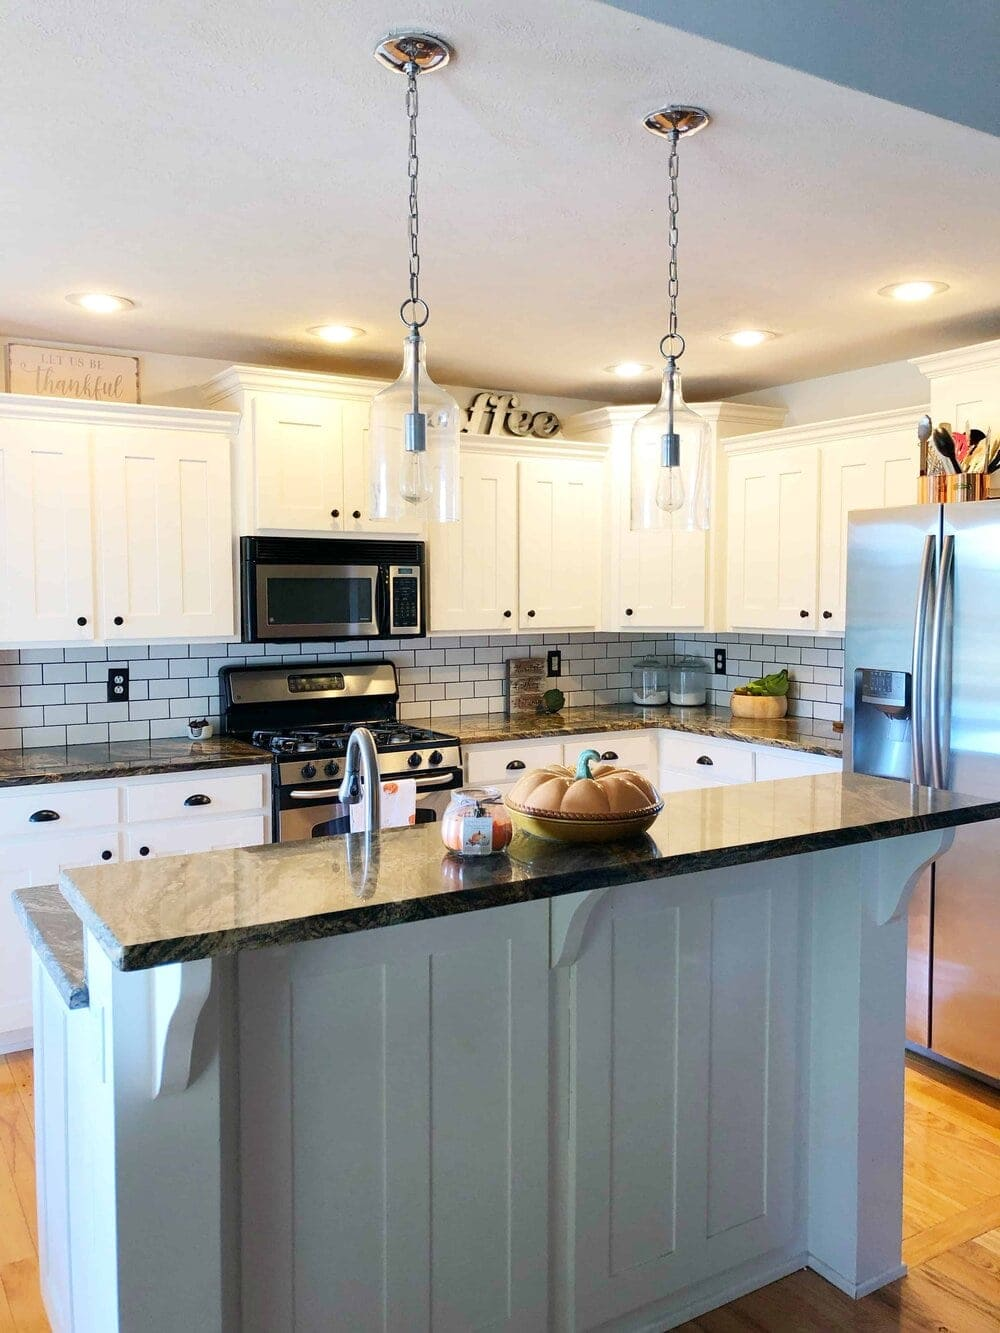 Missouri Girl Blog. Missouri Girl DIY kitchen renovation.